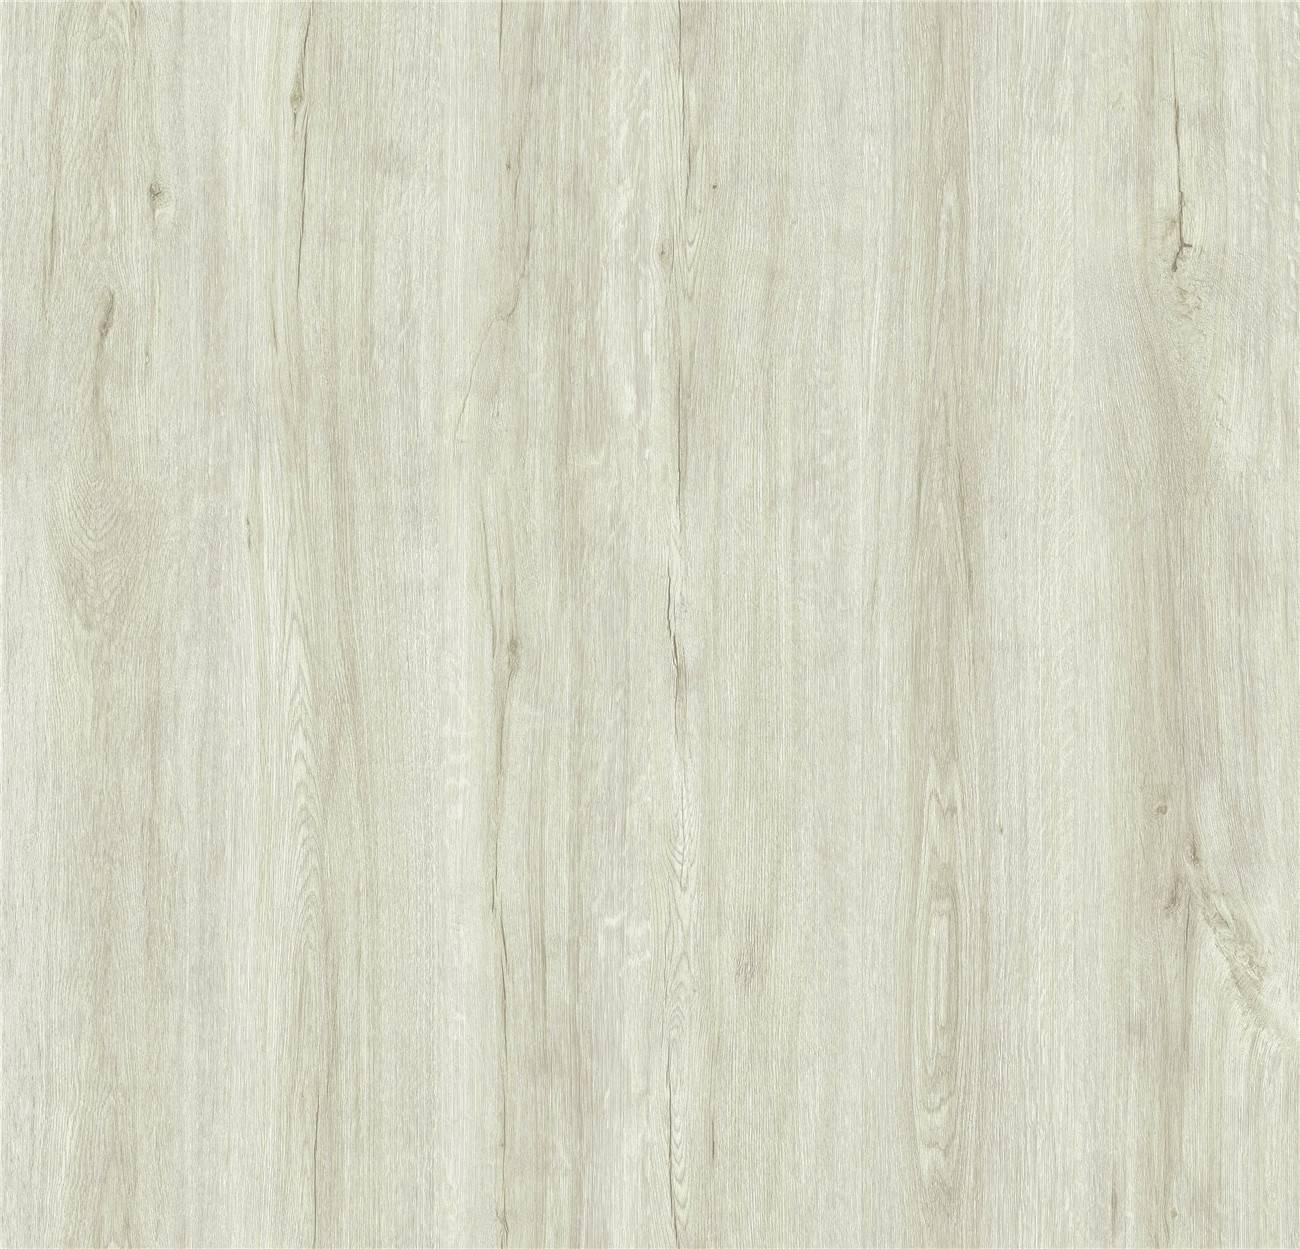 I.DECOR ID-7030-1 European Rift Oak ID Series 2017 image46